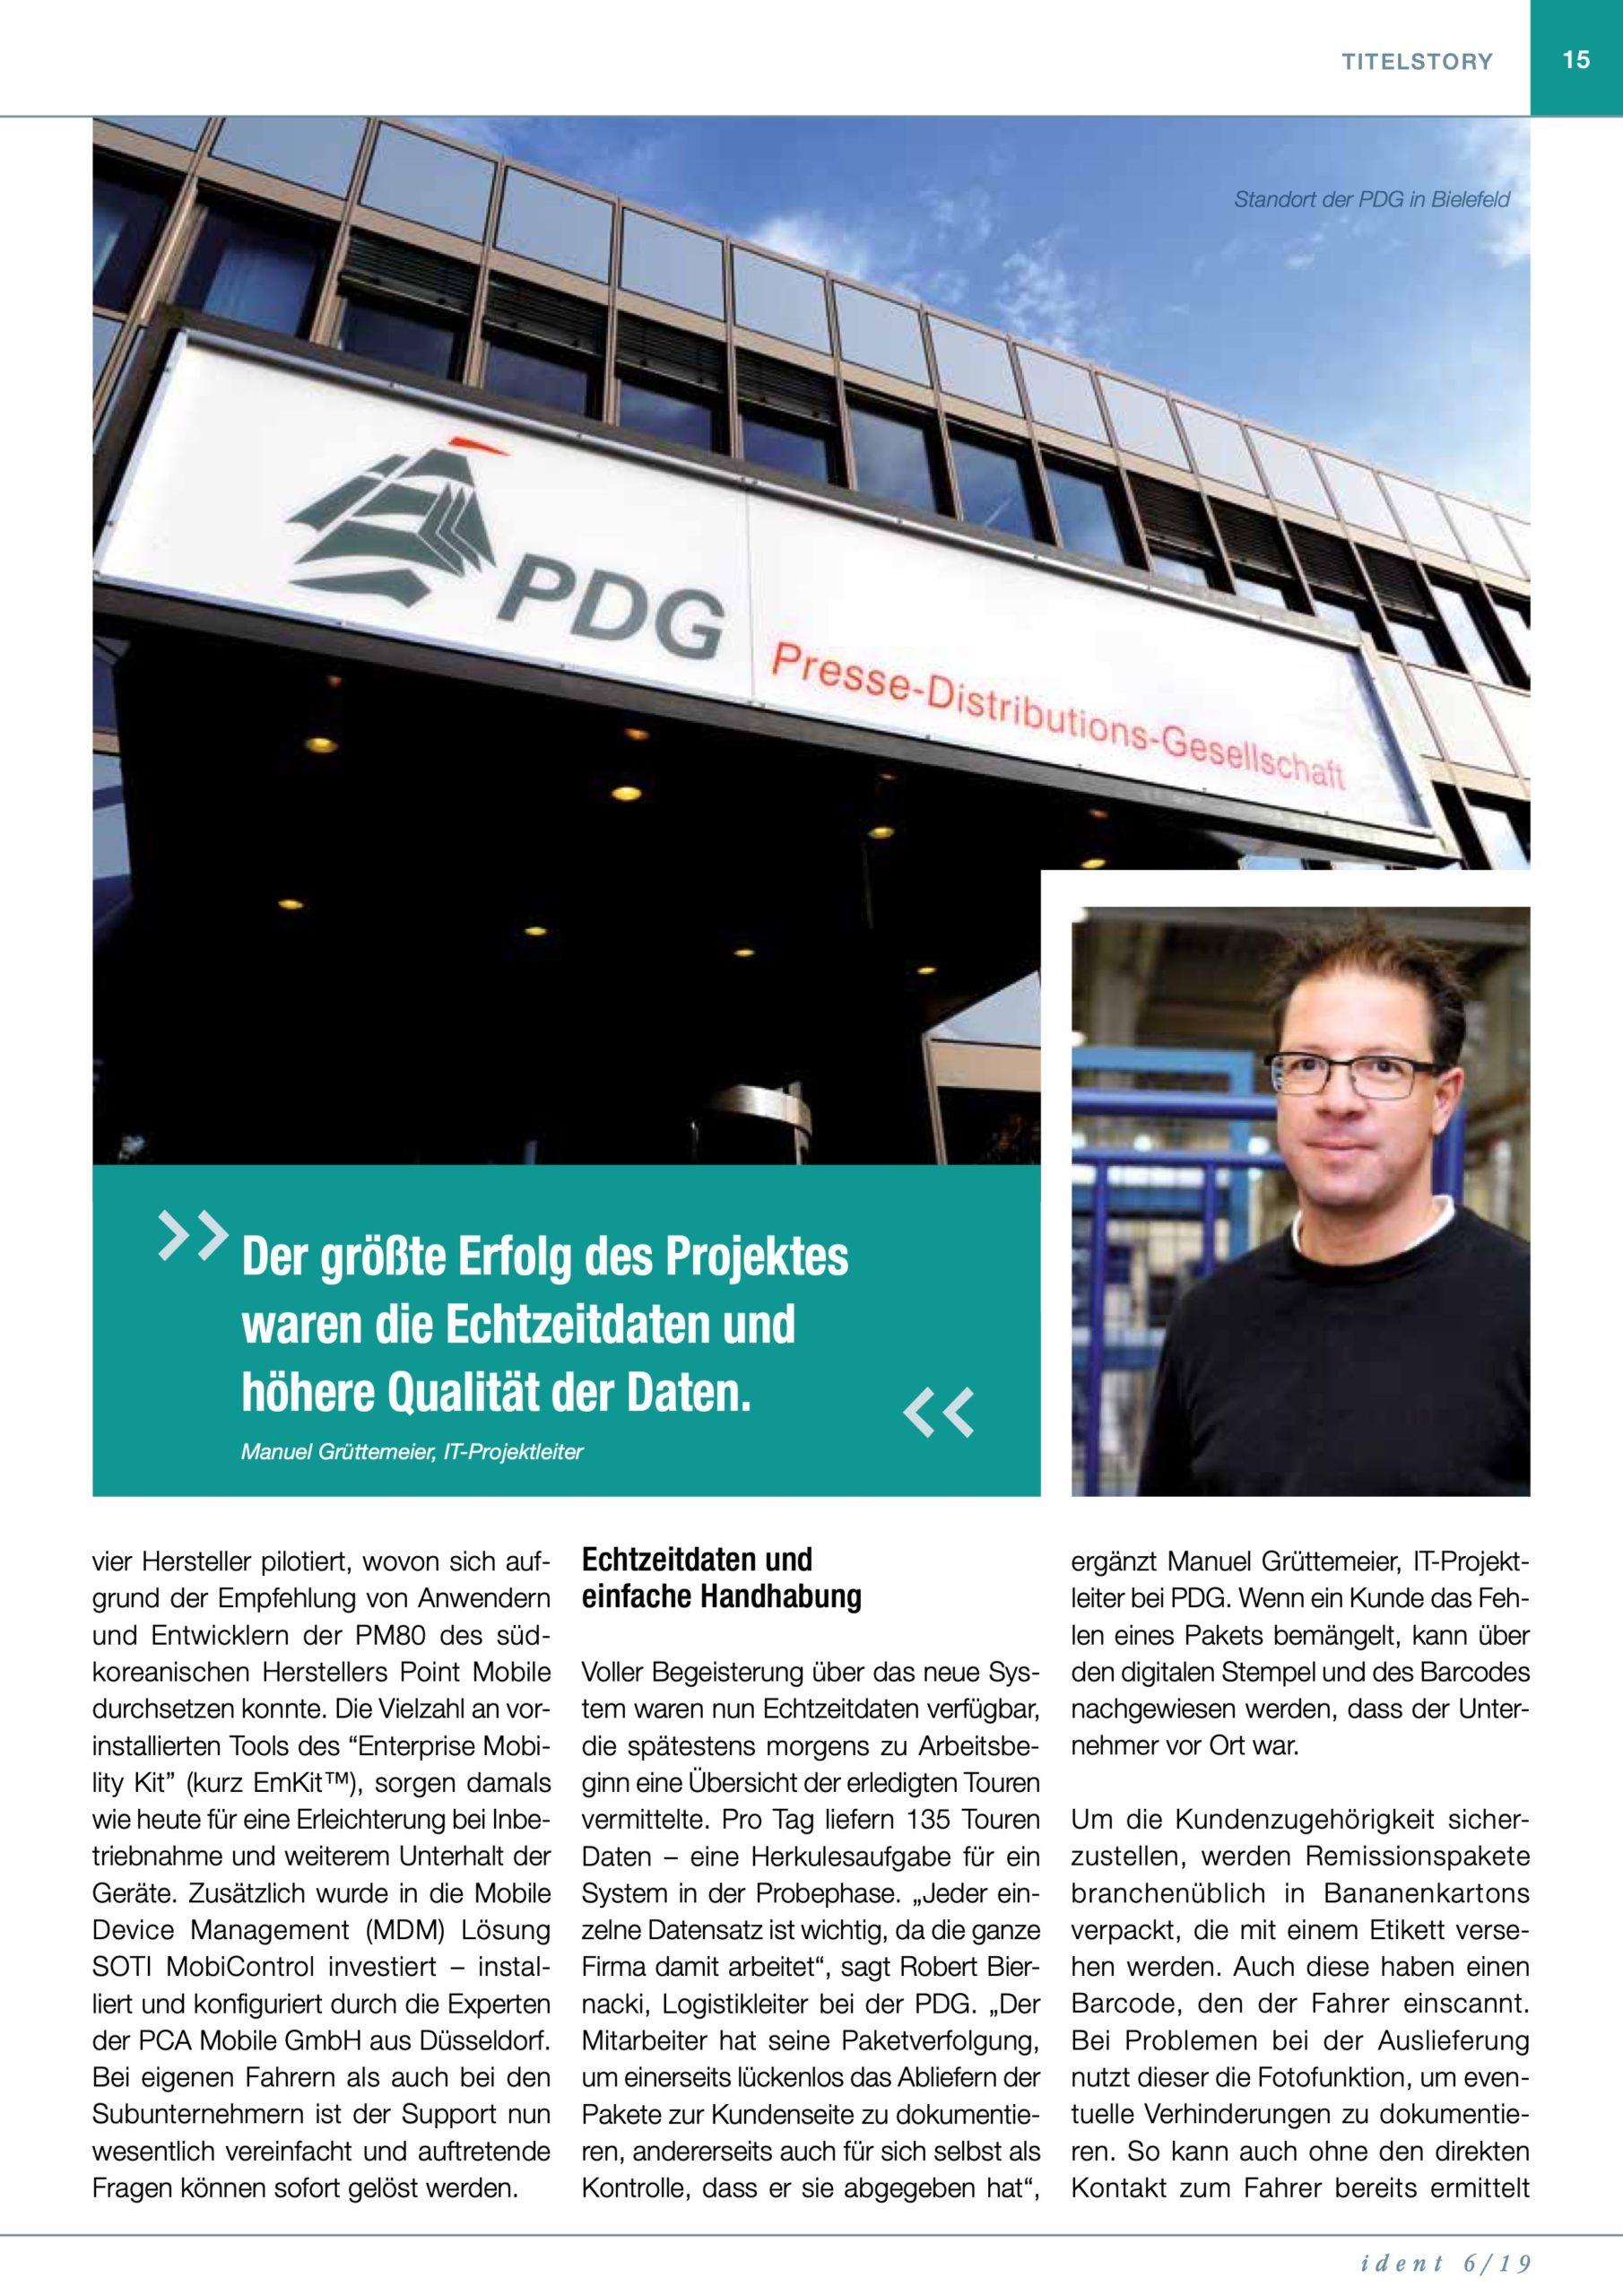 PM85 Referenz bei PDG